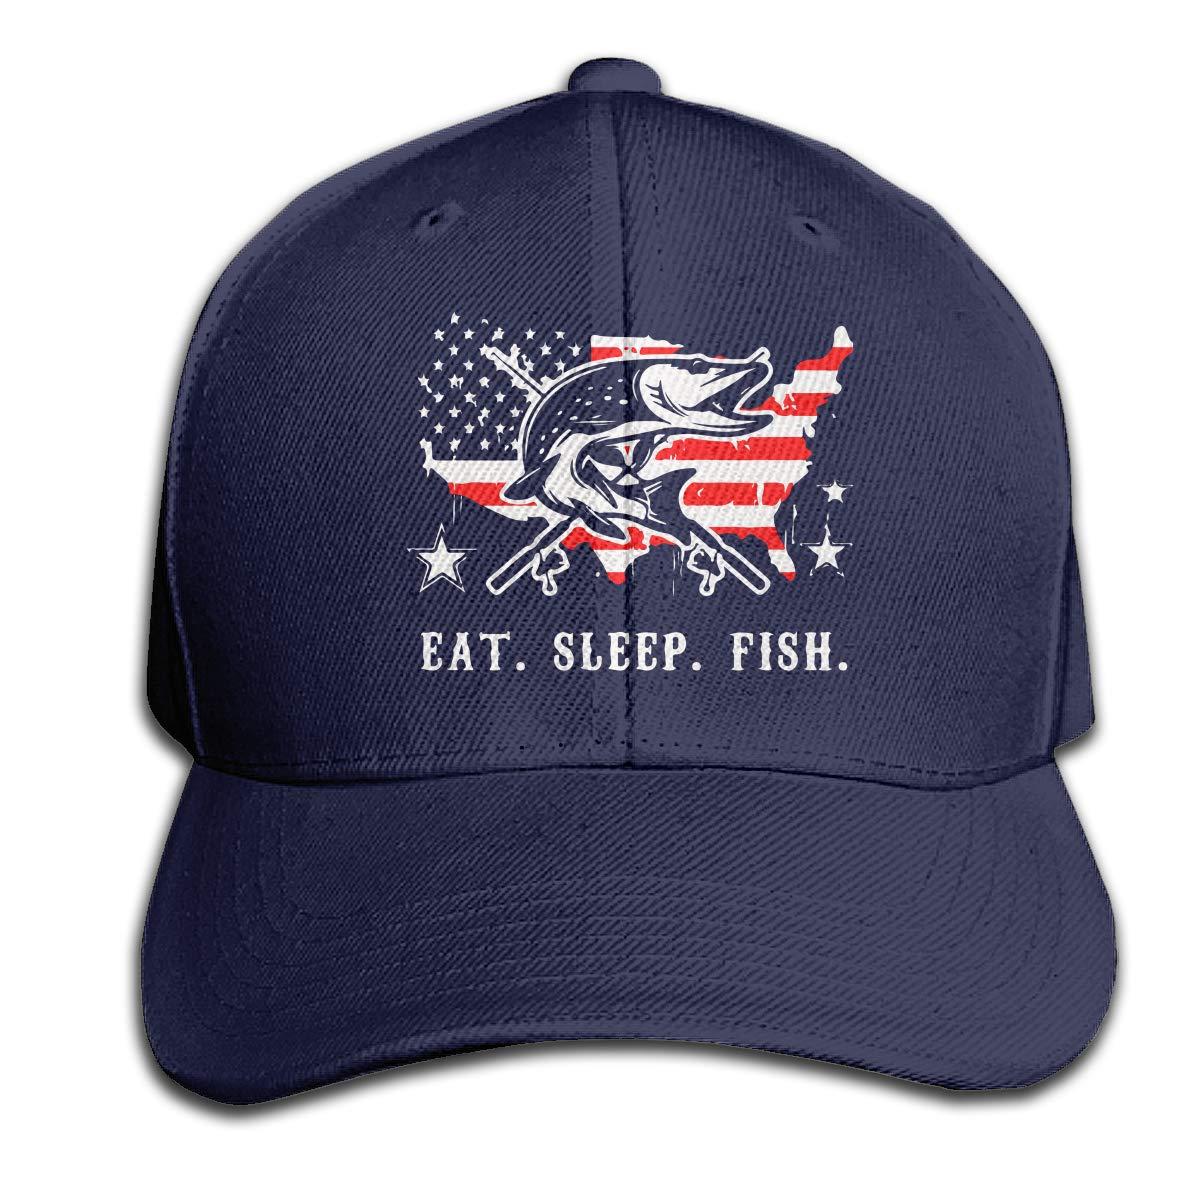 Eat Sleep Fish Fisher American Flag Fishing Unisex Baseball Cap Adjustable Plain Hat for Women Men